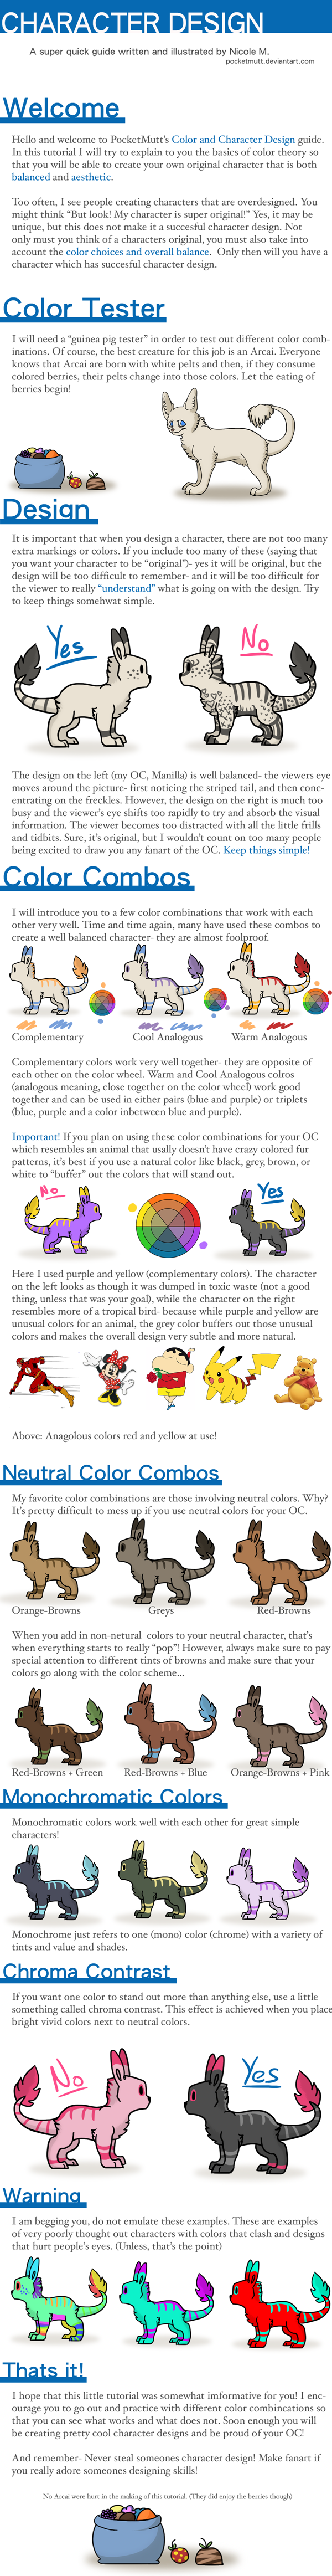 Character Design Sheet Tutorial : Character design tutorial by i moosker on deviantart